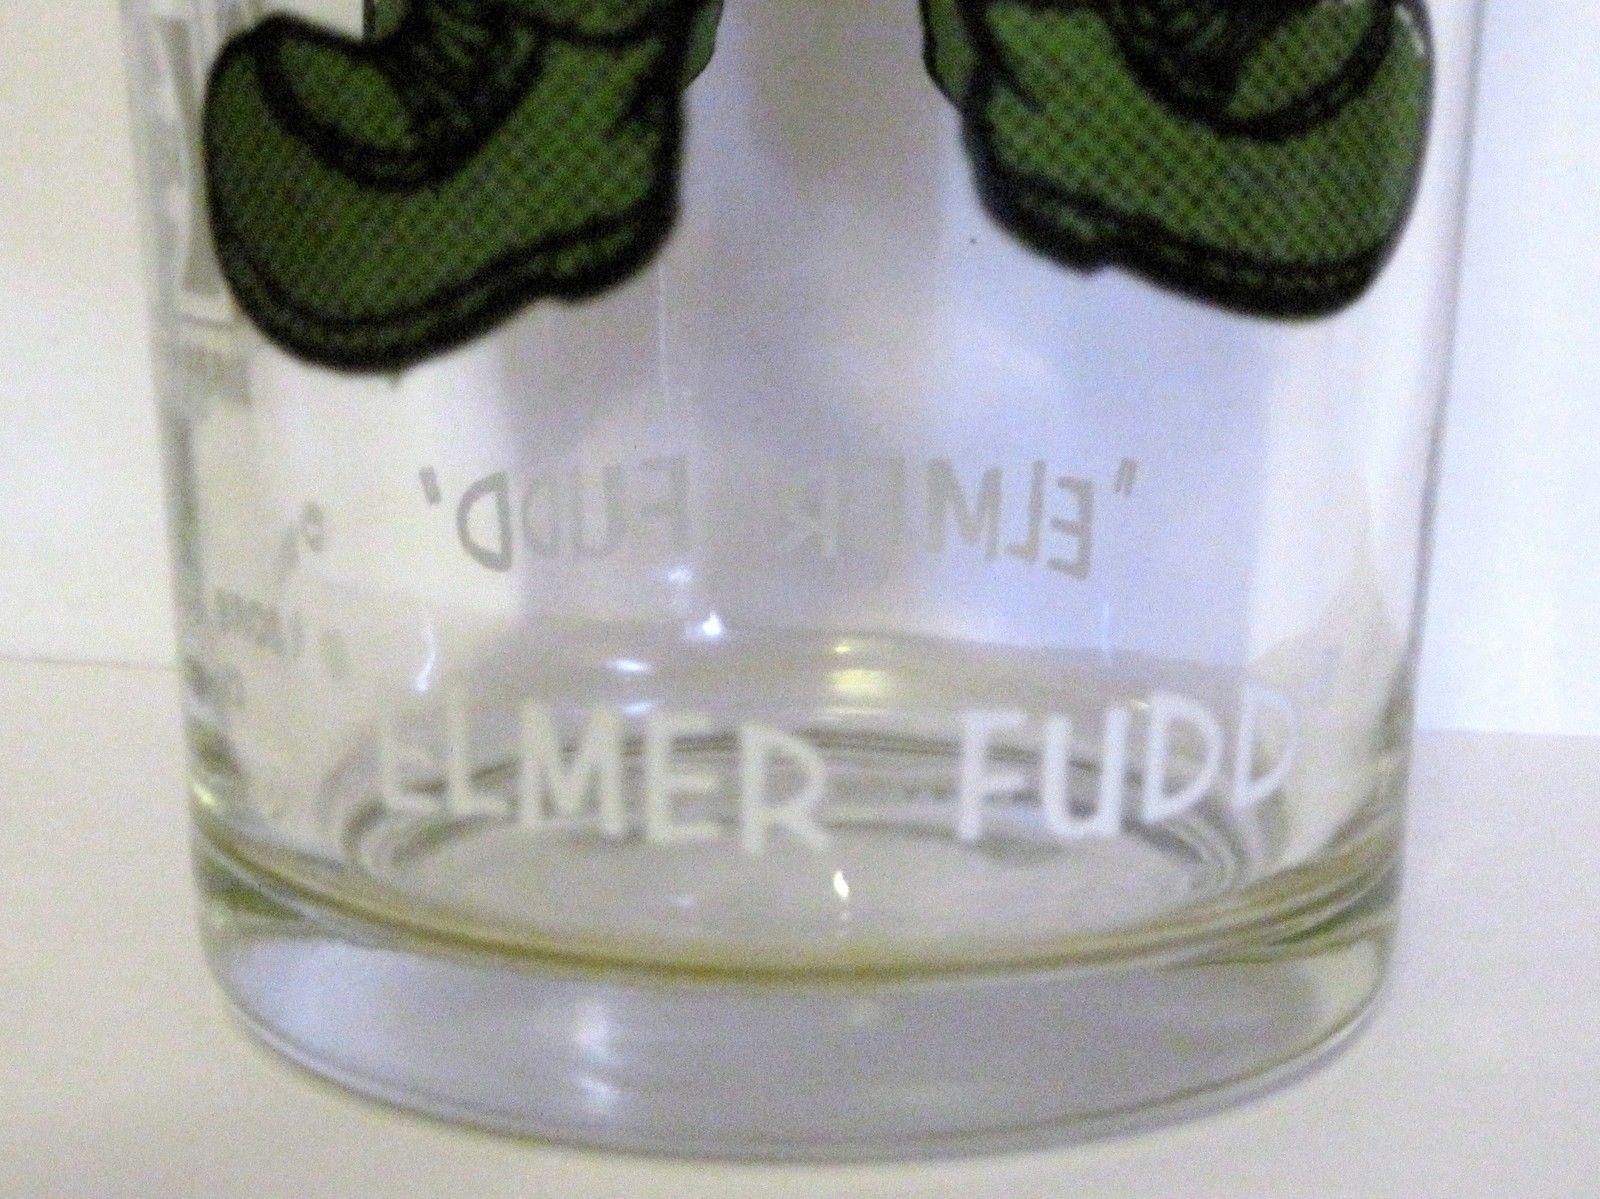 Pepsi Collector Series Glass Tumbler 1973  Elmer Fudd Looney Tunes Warner Bros image 2